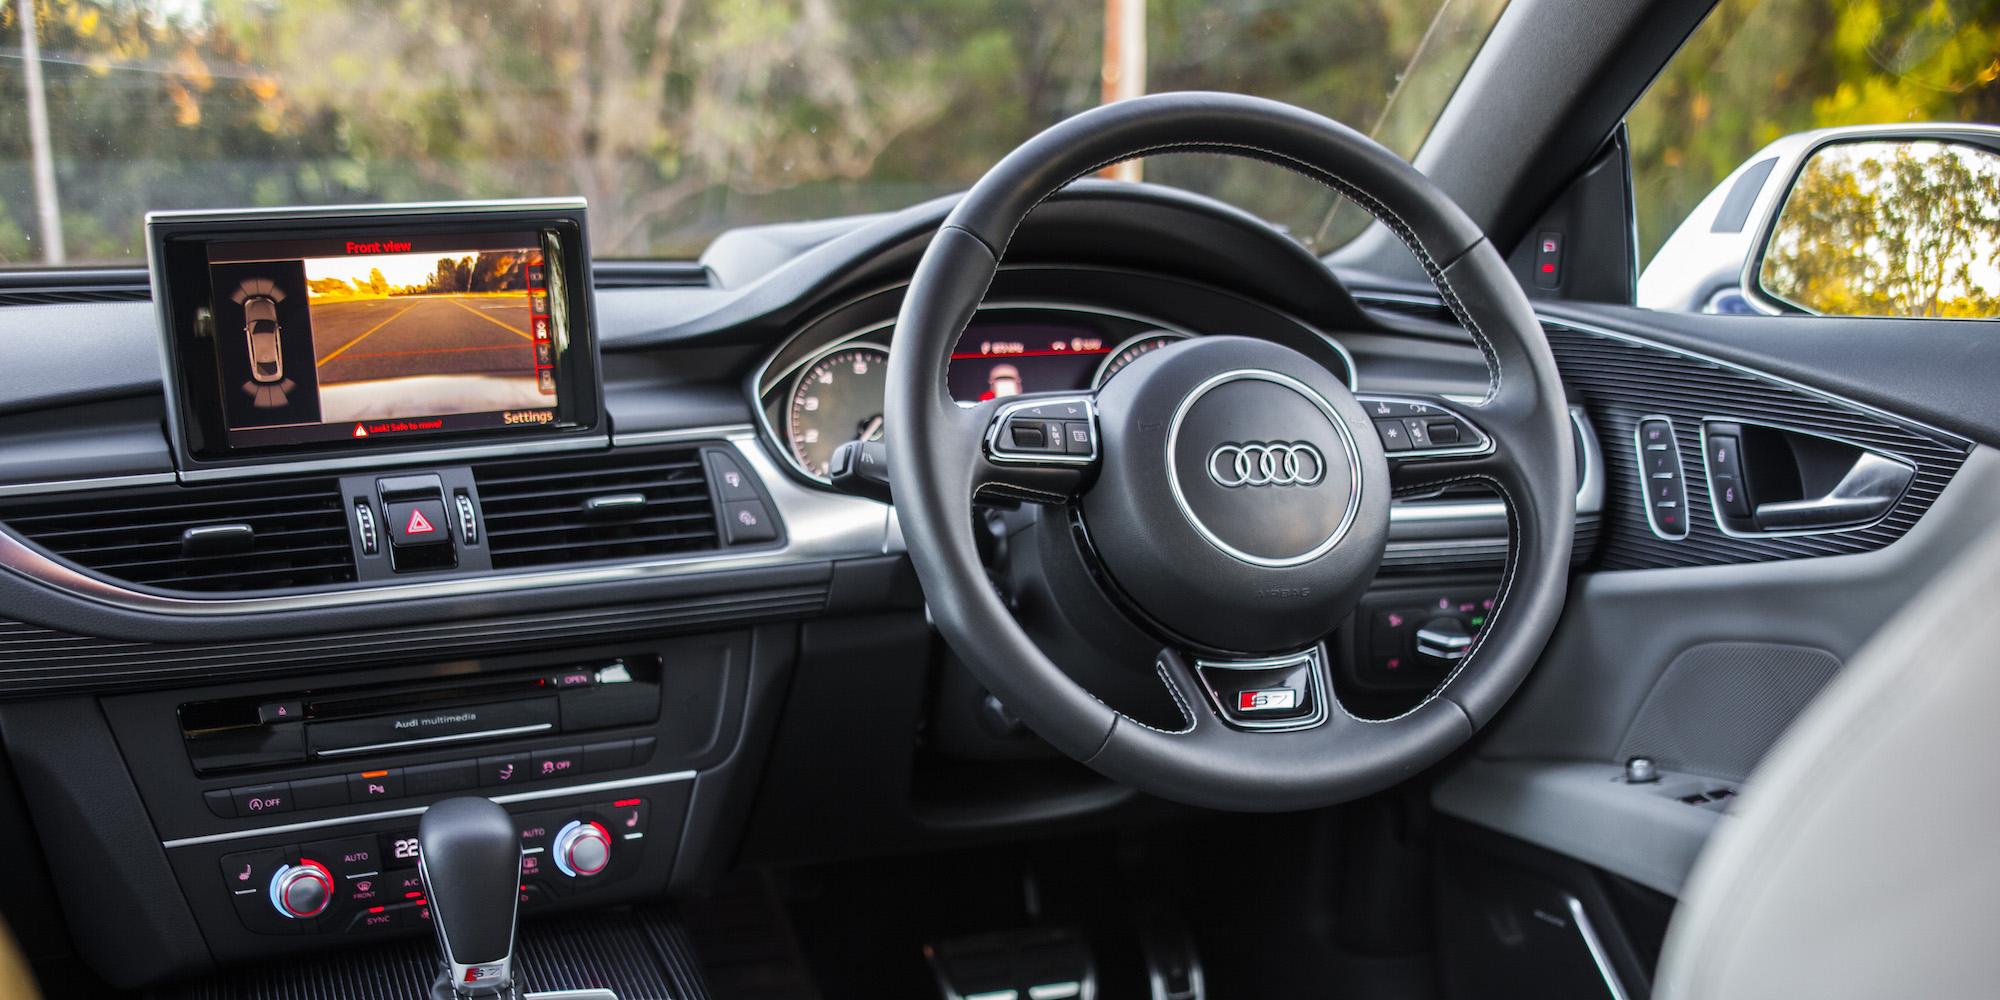 2016 Audi S7 Steering